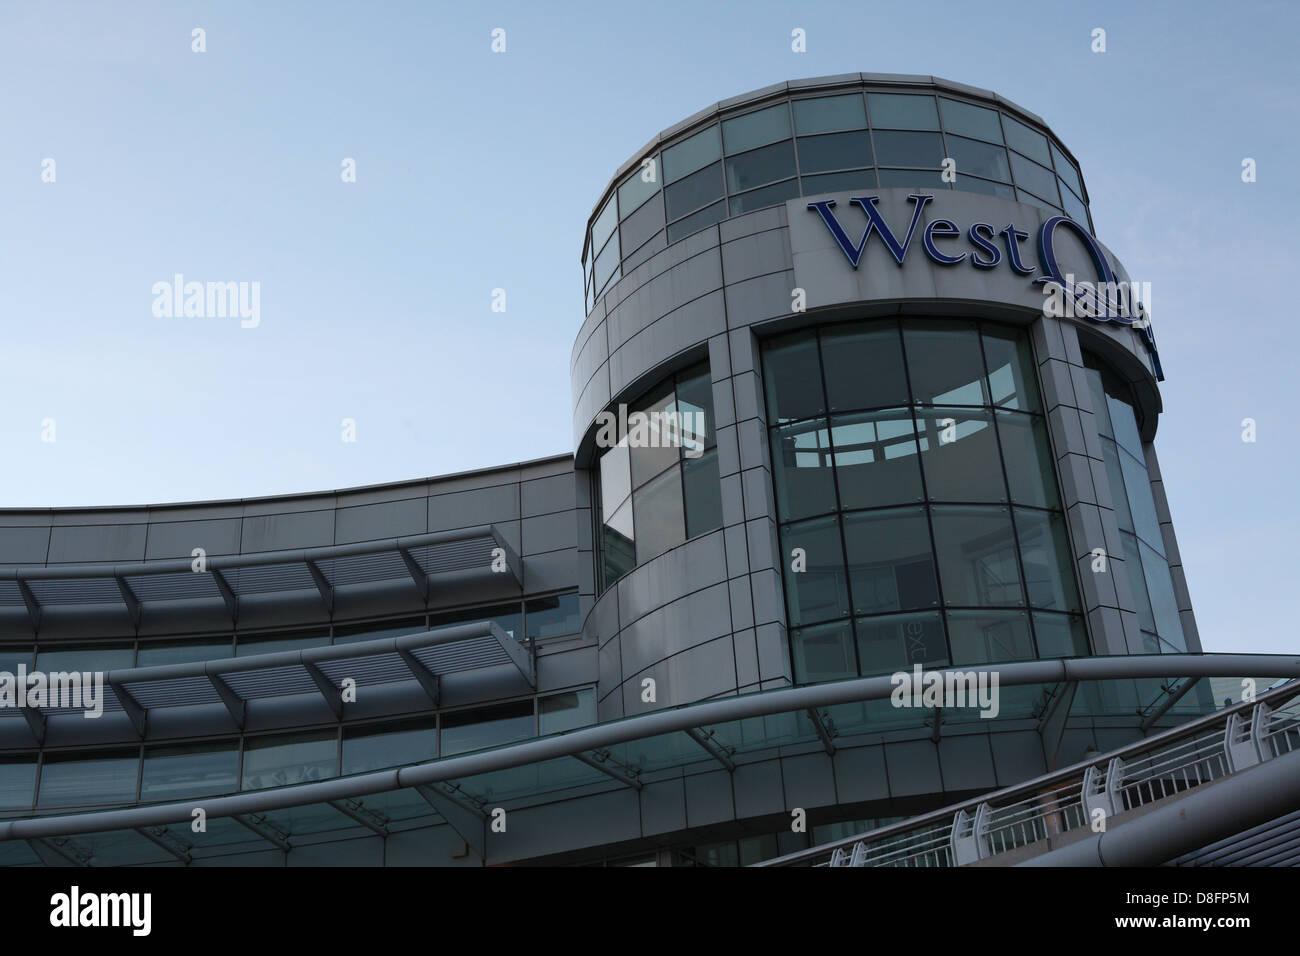 West QUAY - Stock Image